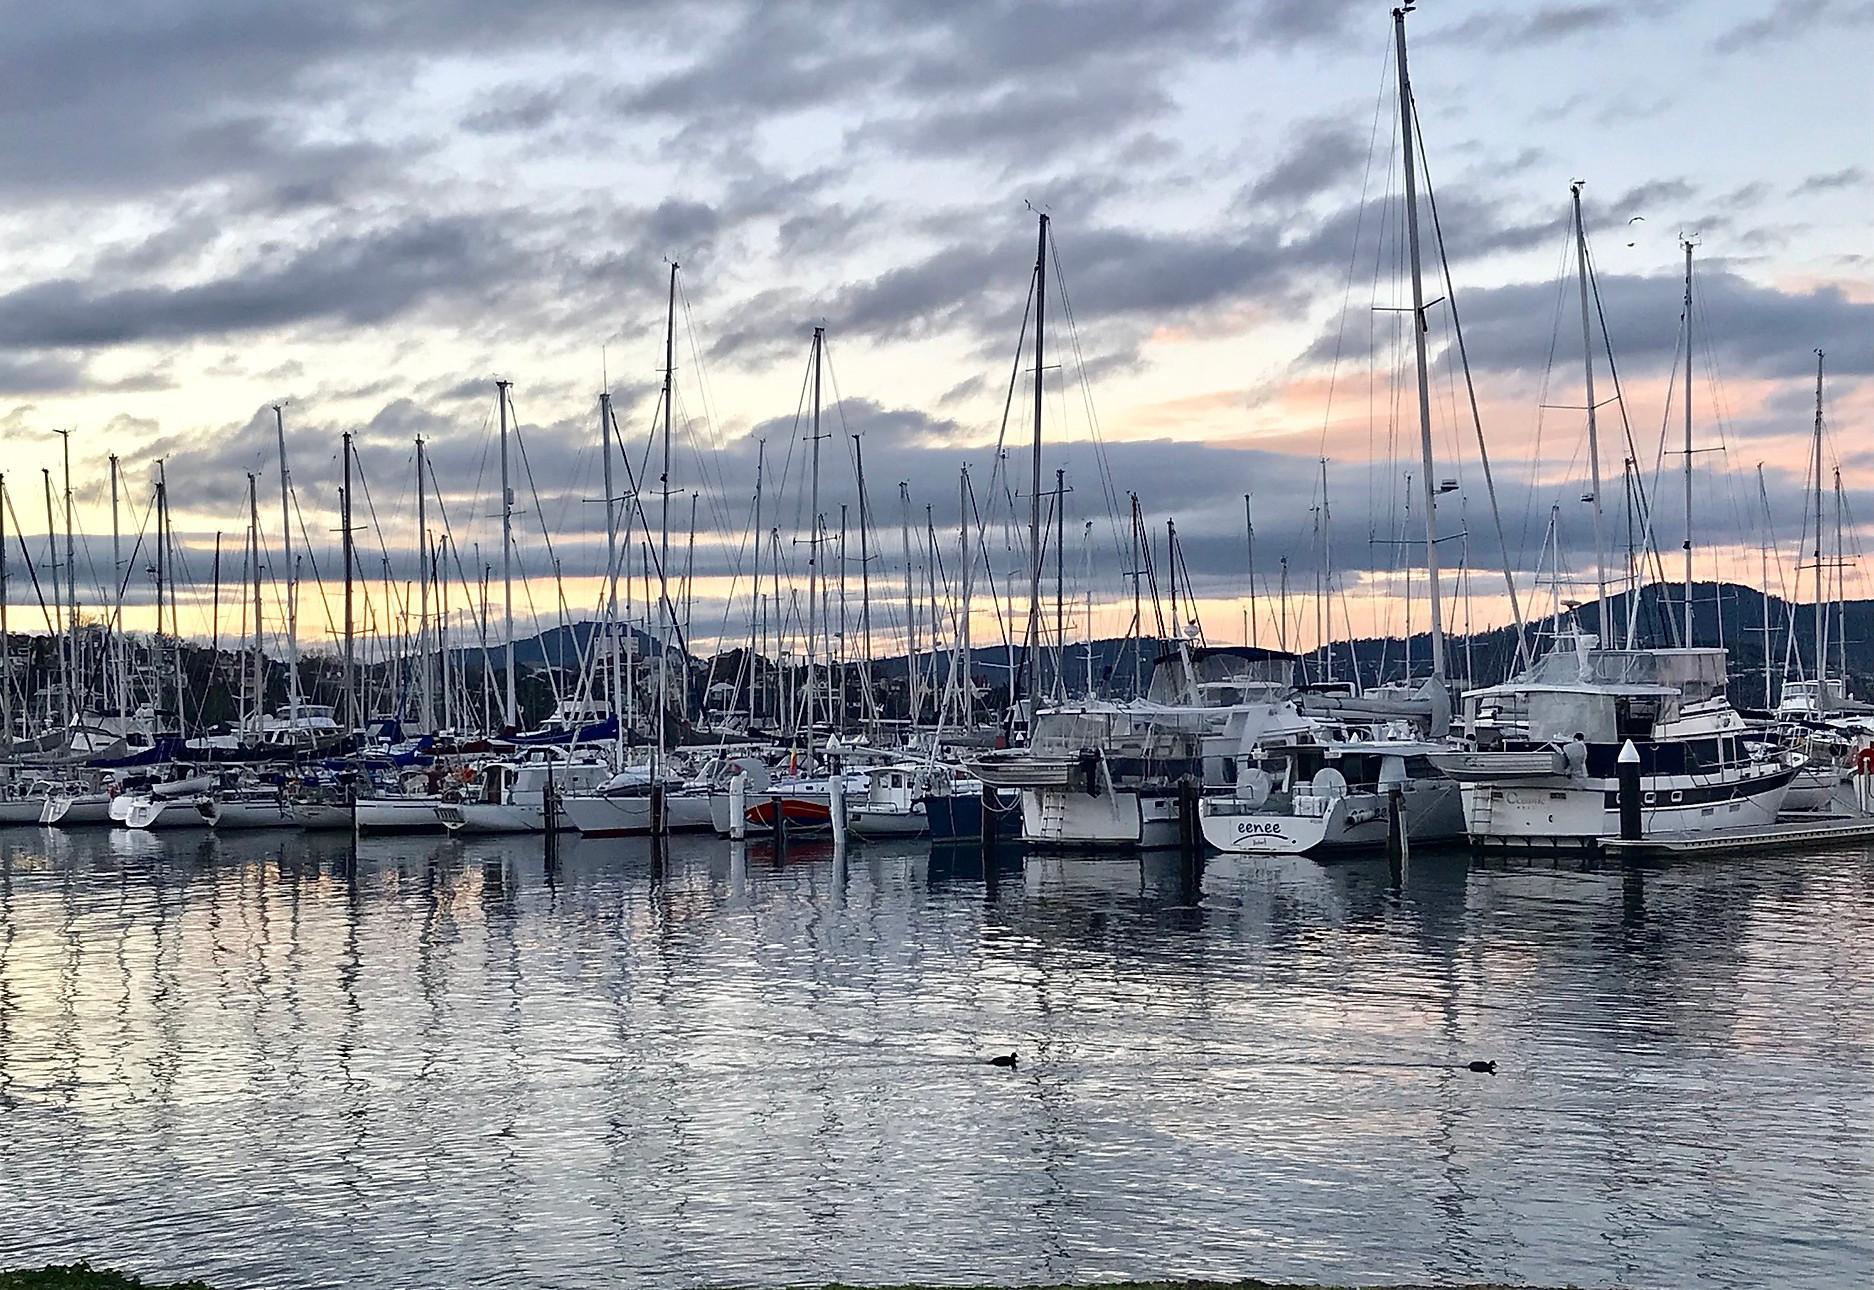 Хобарт, Саламанка — Тасмания 2018 — Блог о путешествиях Сергея Чеботова